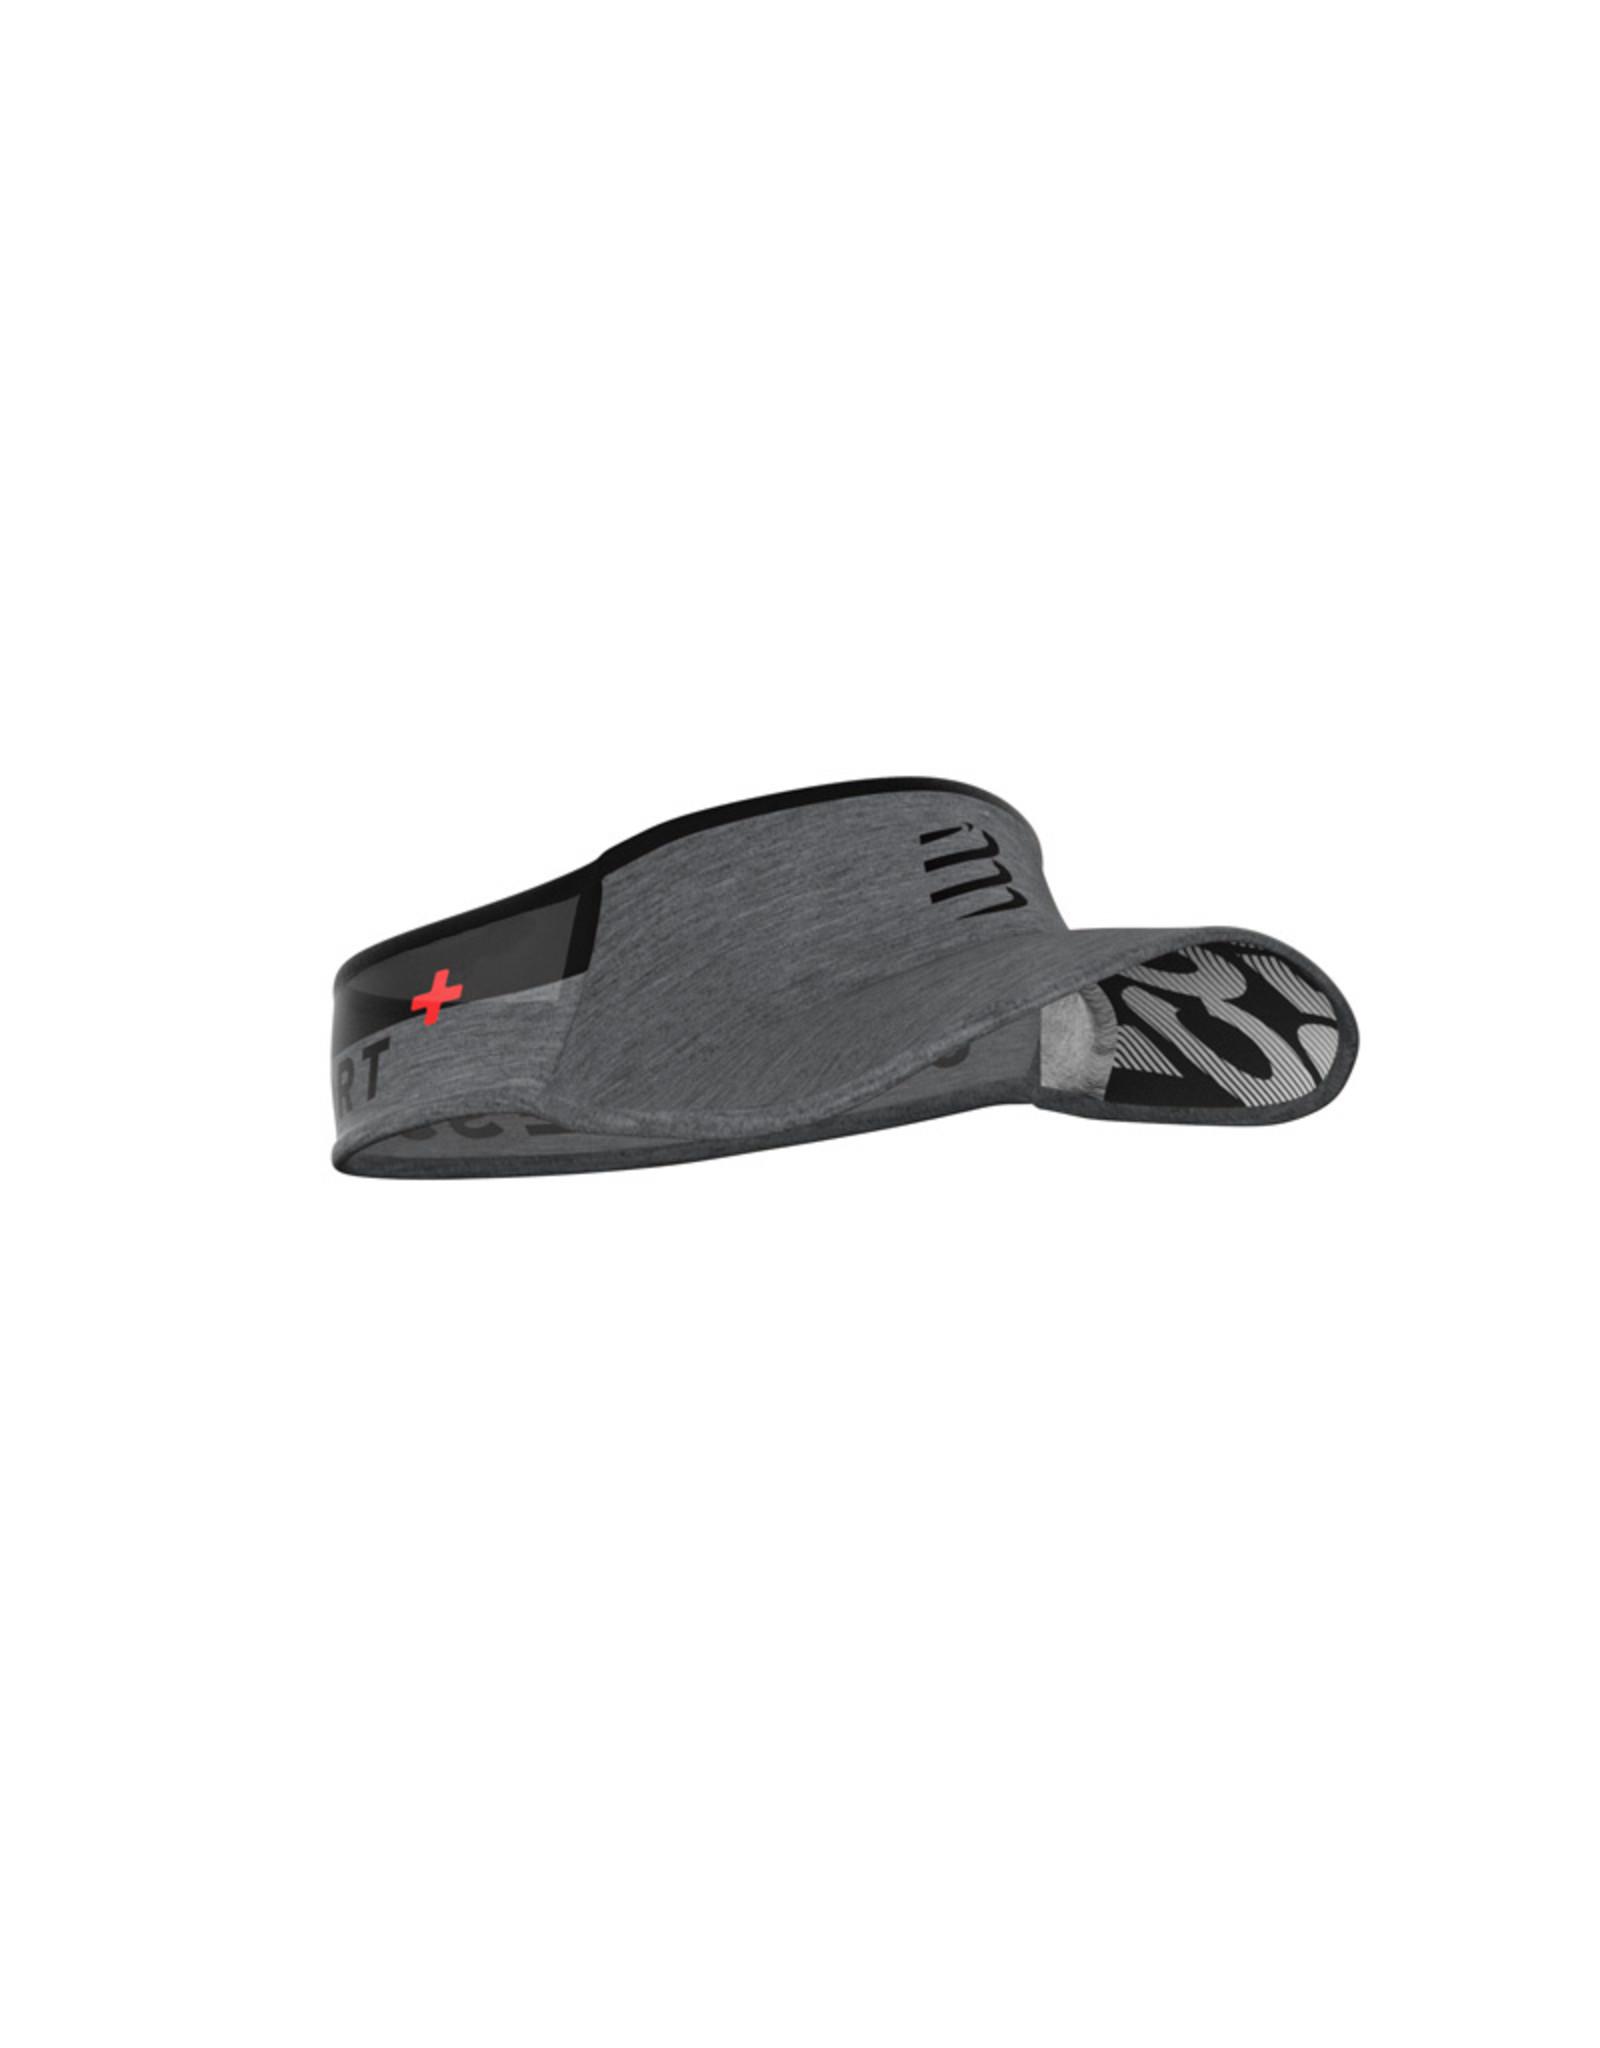 Compressport Visor Ultralight - Grijs